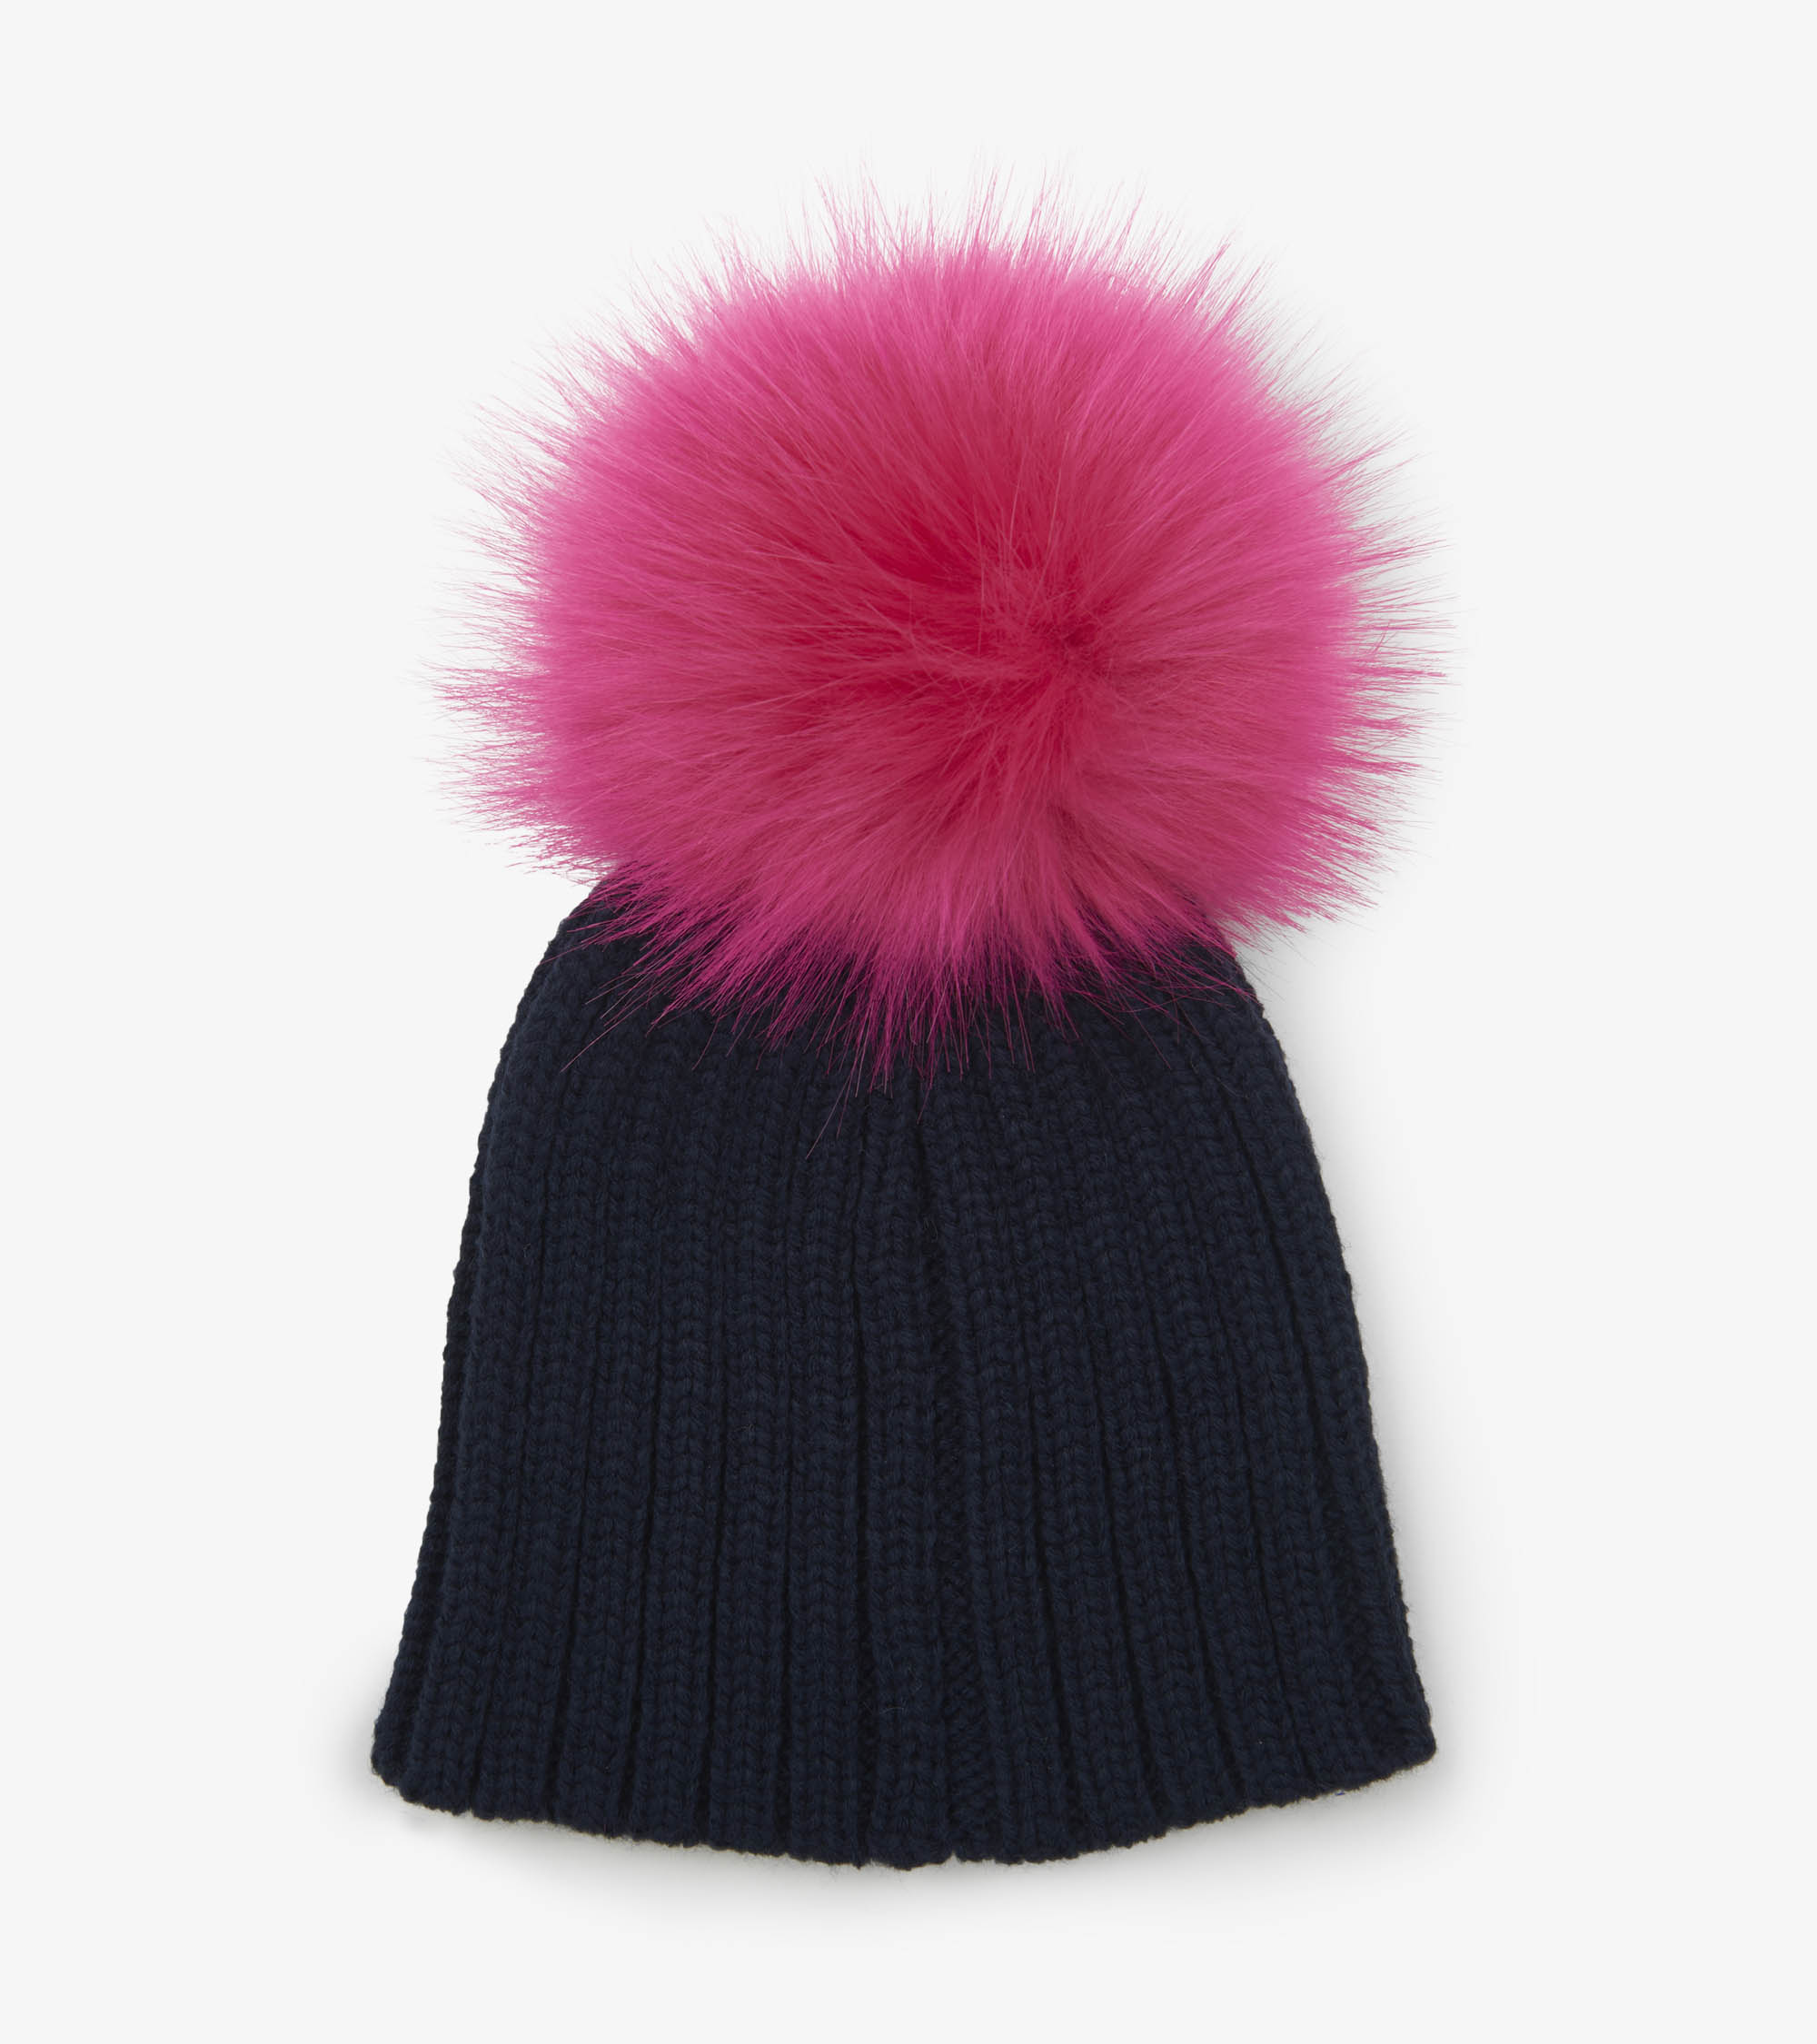 Hatley Pink Pom Pom Winter Hat